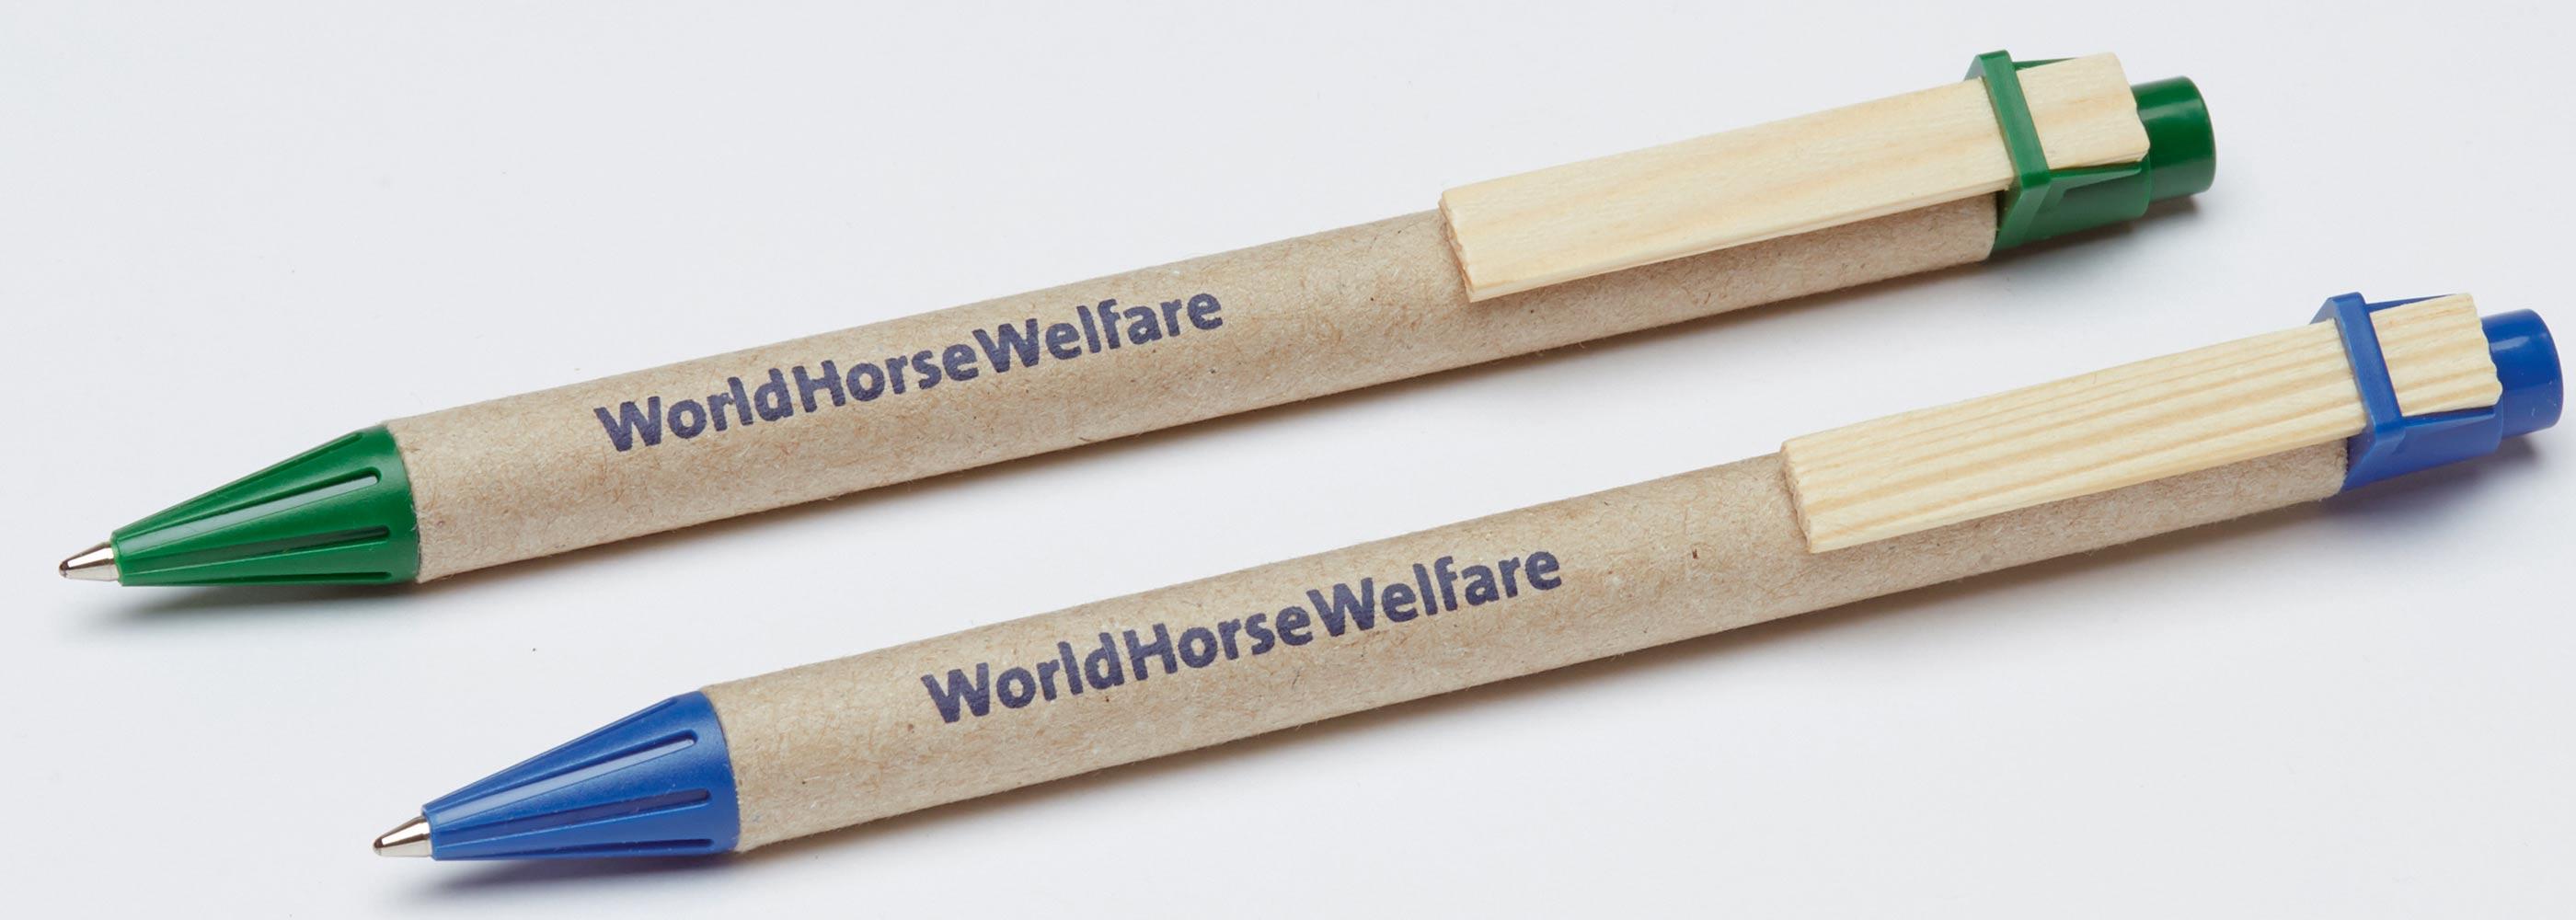 Eco-friendly WHW pens